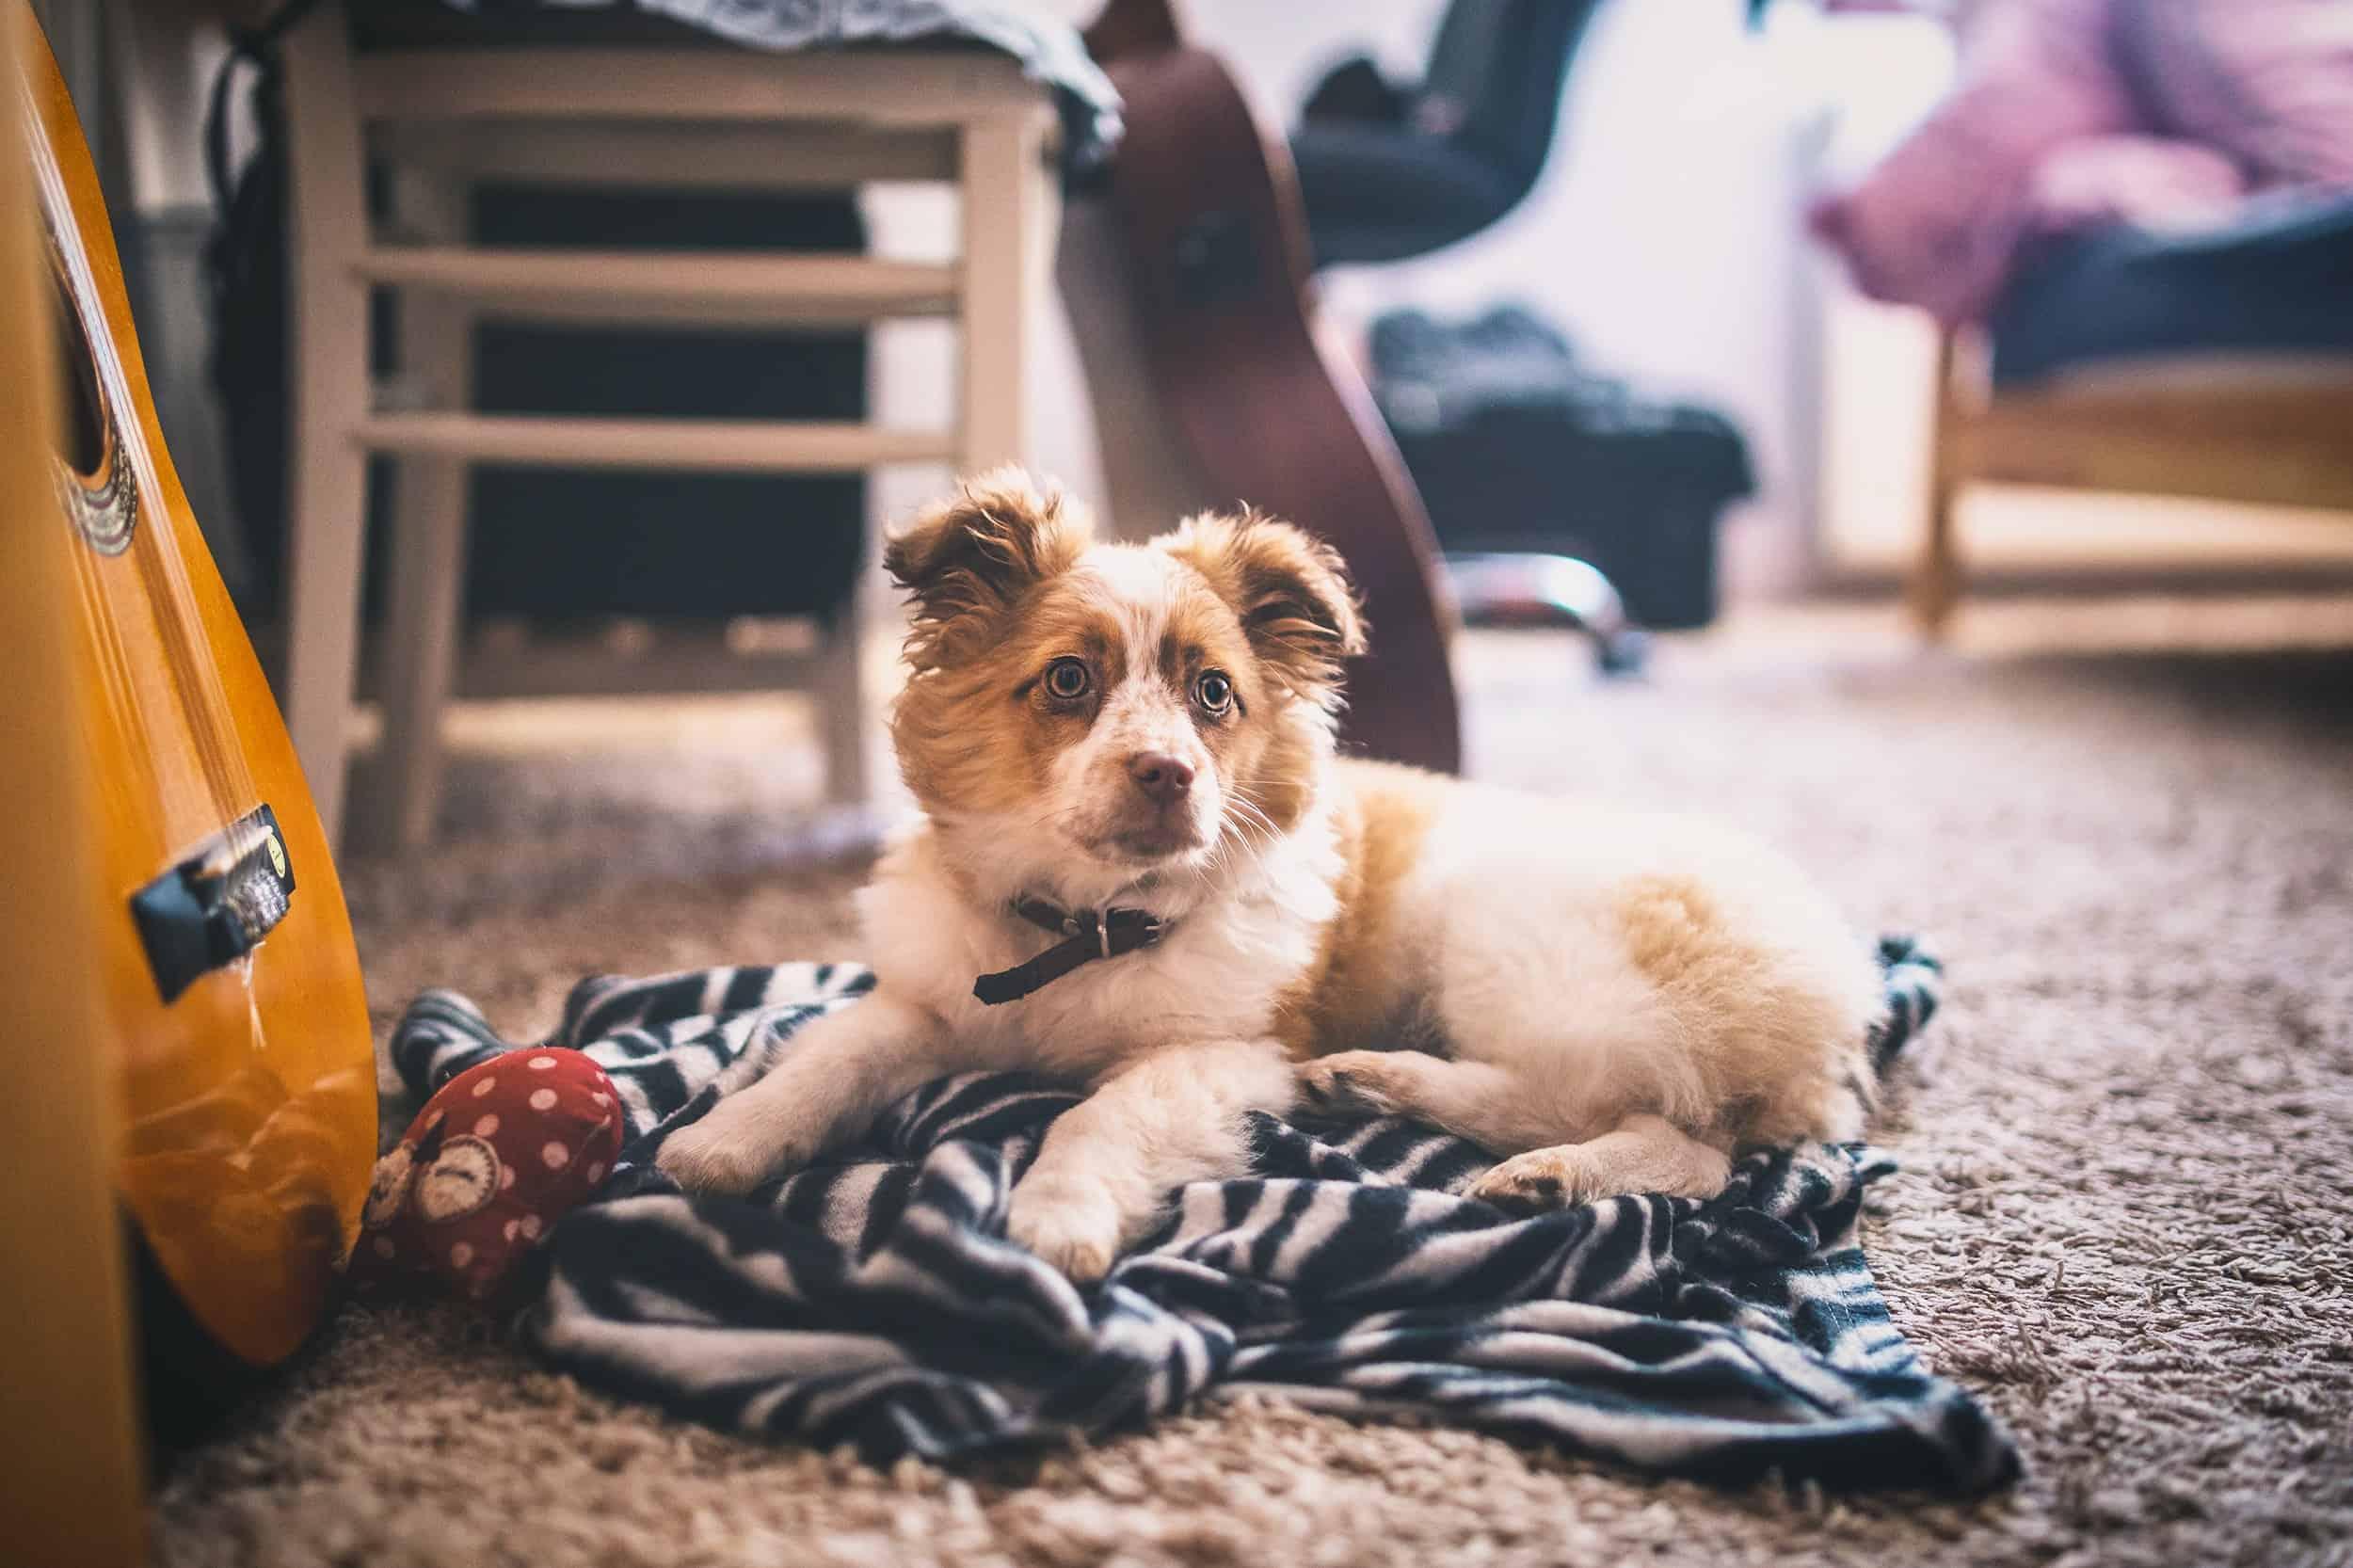 dog on a blanket on the floor